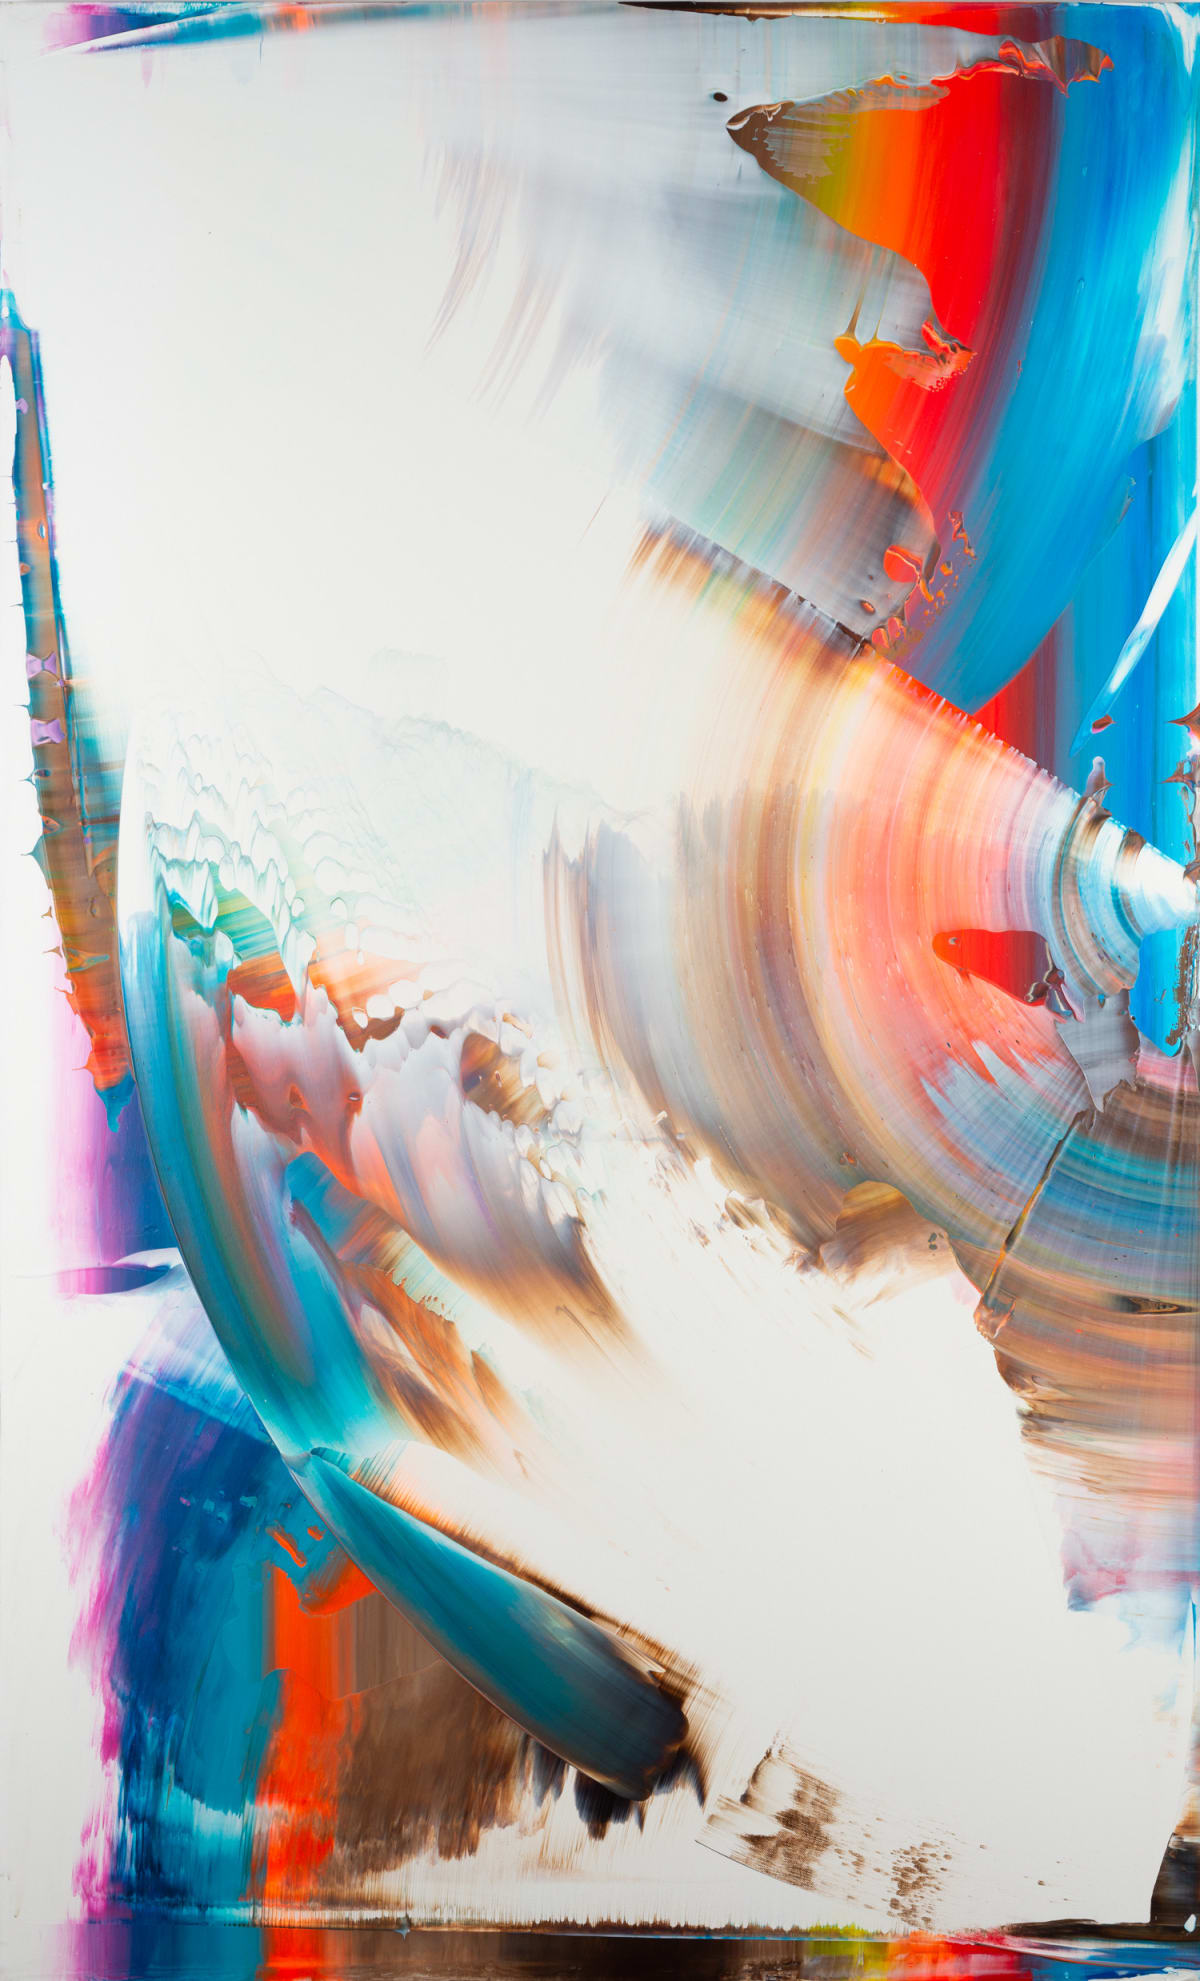 Alex Kuznetsov Untitled , 2016 Acrylic on Canvas 146 x 89 x 5 cm 57 1/2 x 35 1/8 x 2 in